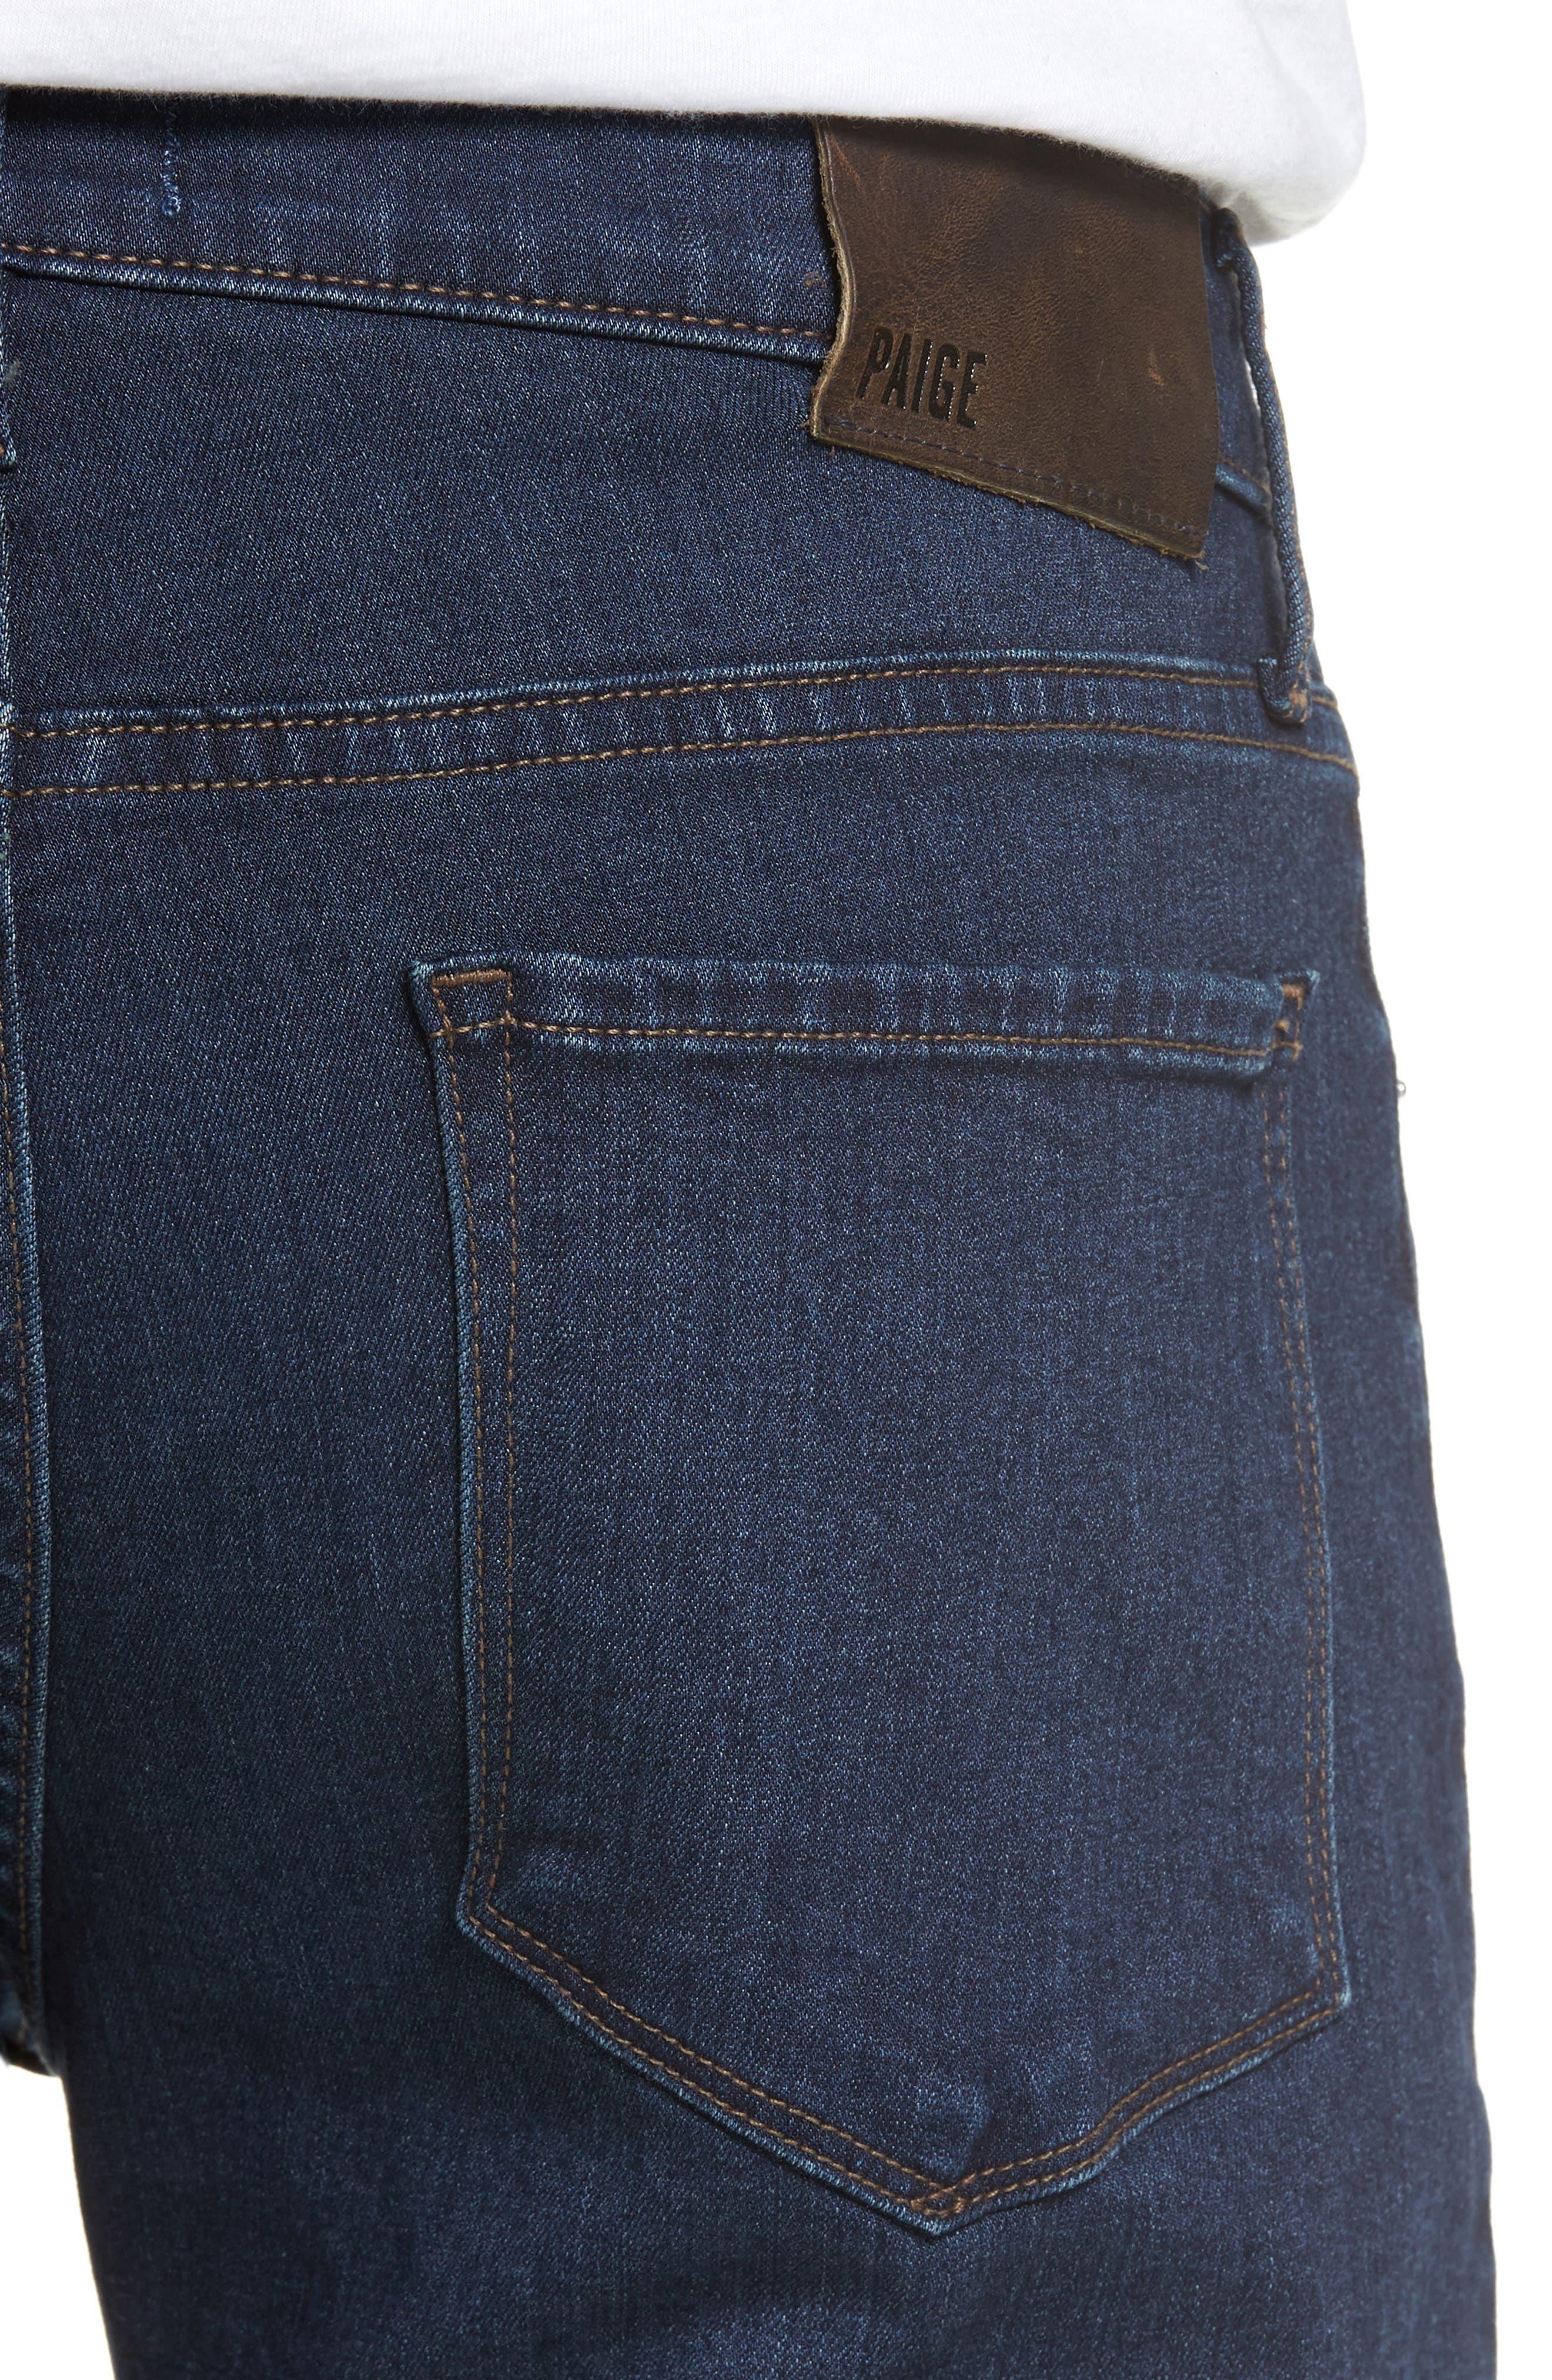 Normandie Straight Leg Jeans,                             Alternate thumbnail 4, color,